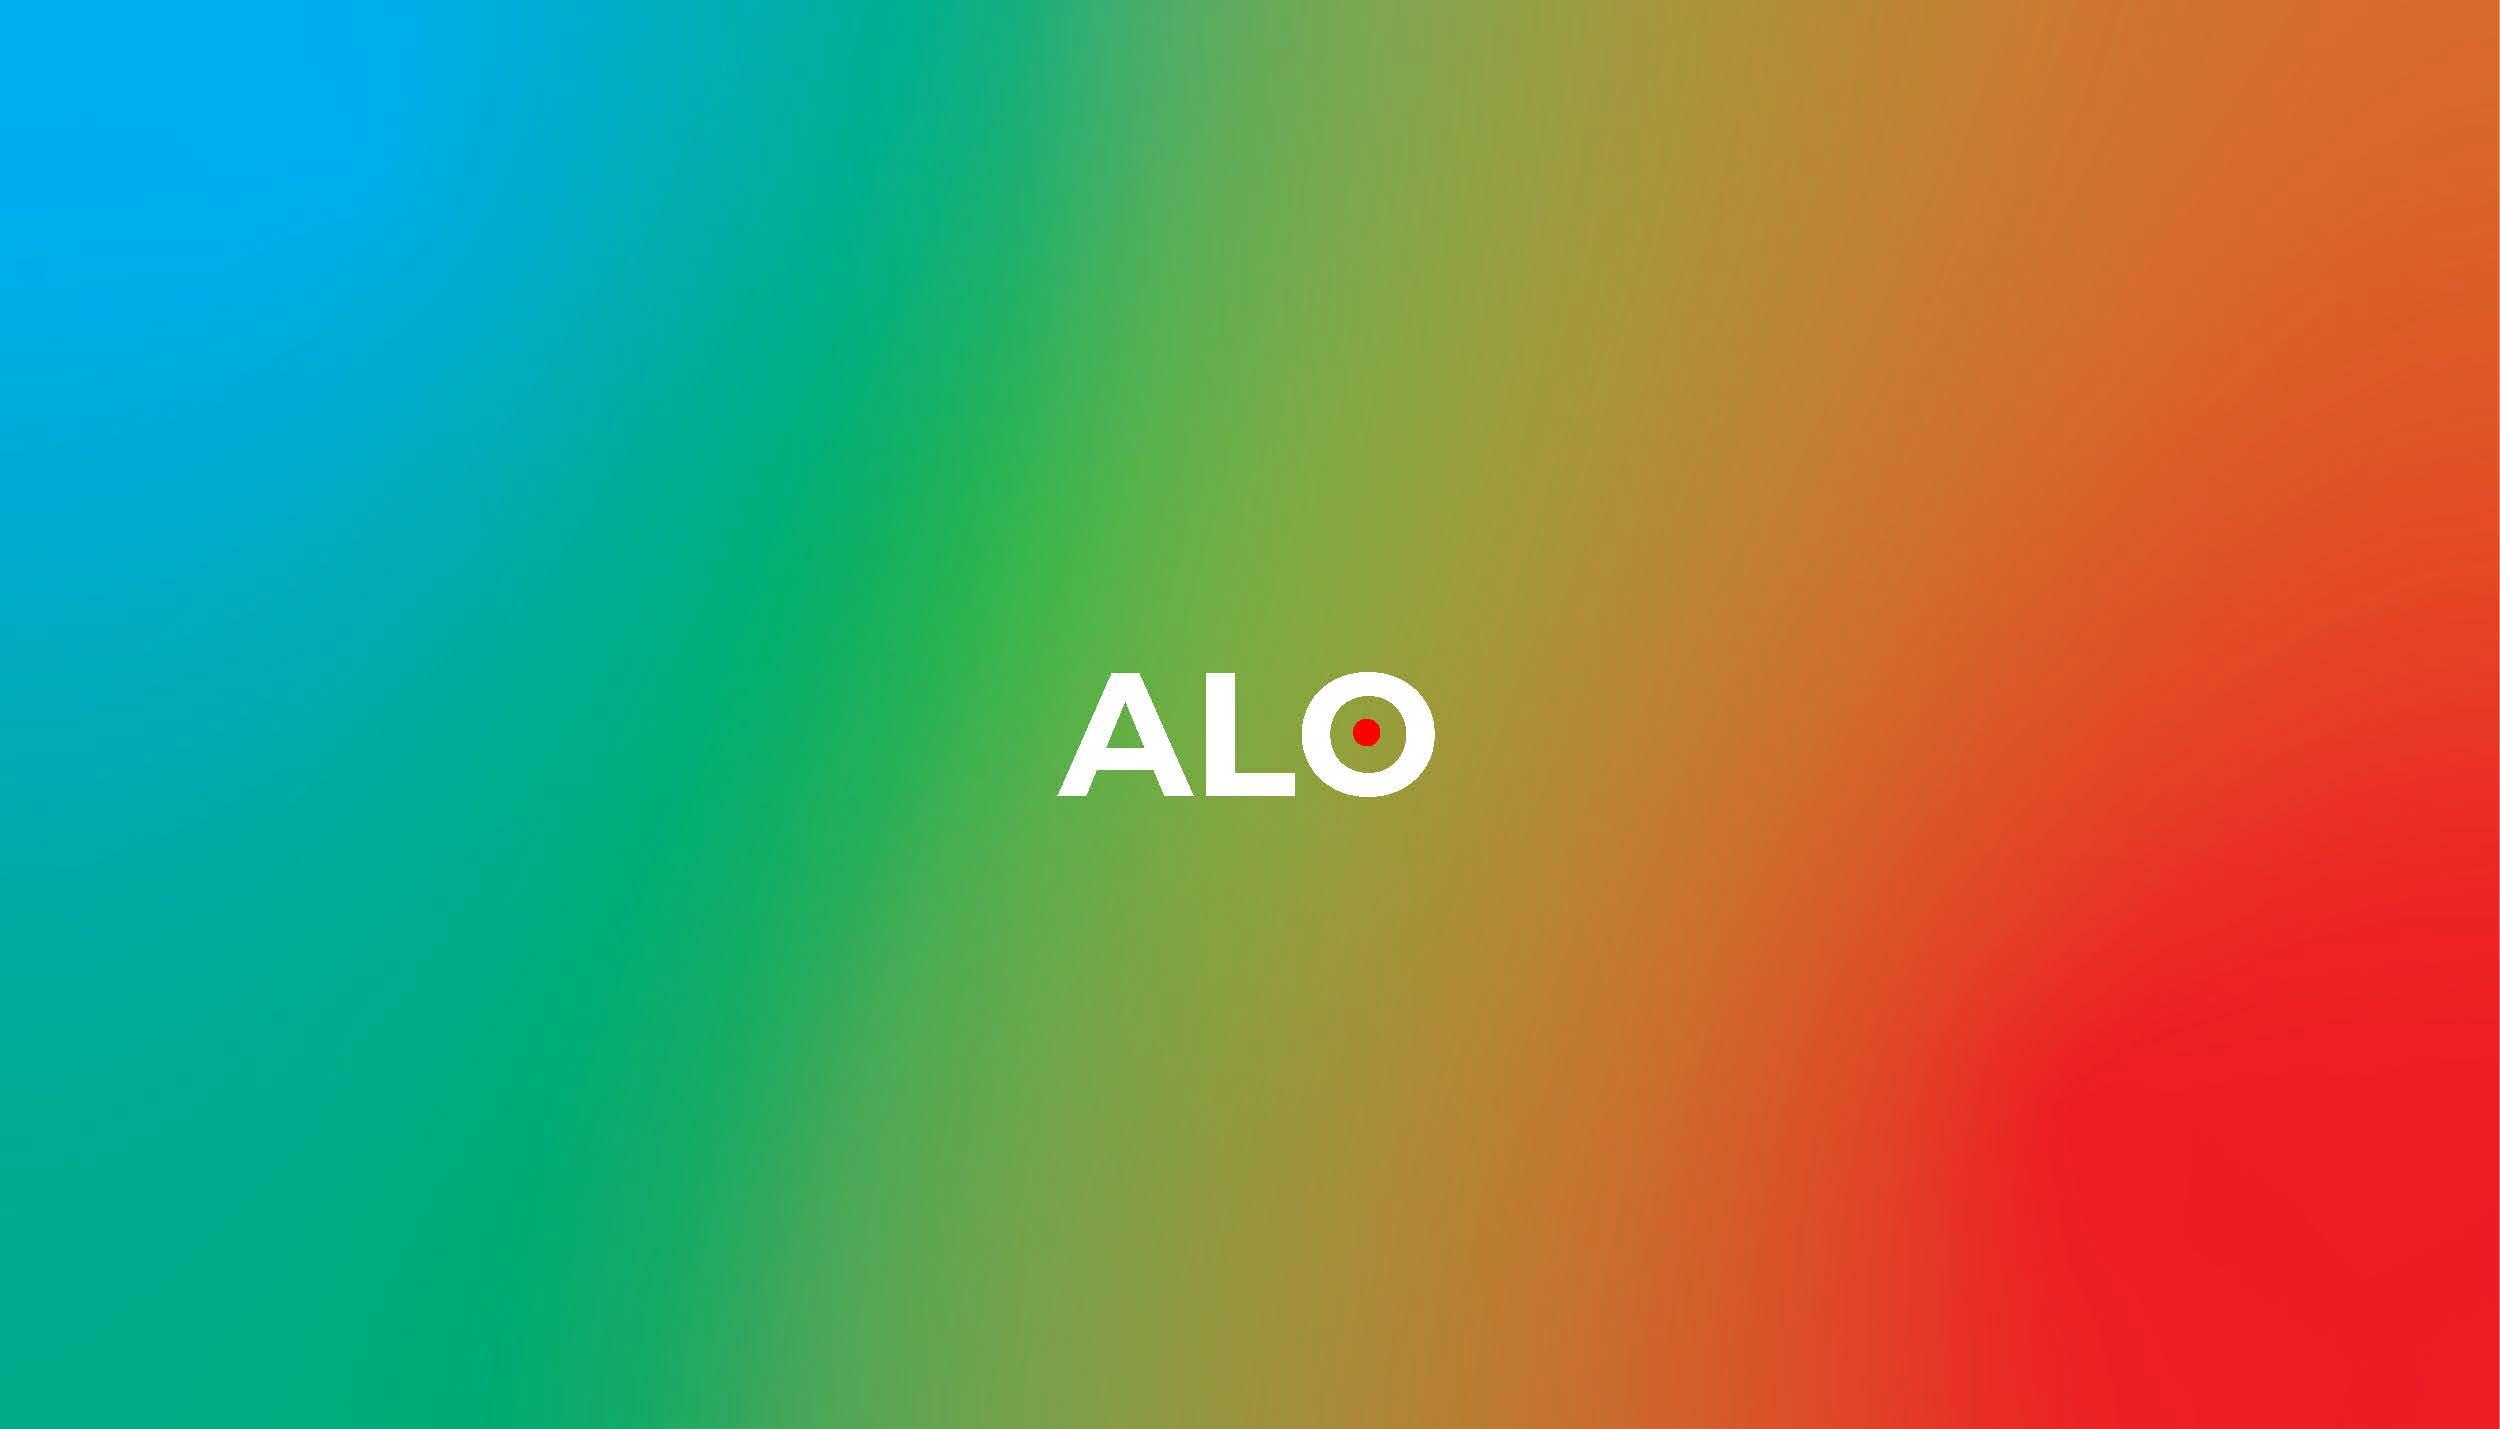 Prototyping_ALO_platform_Page_01